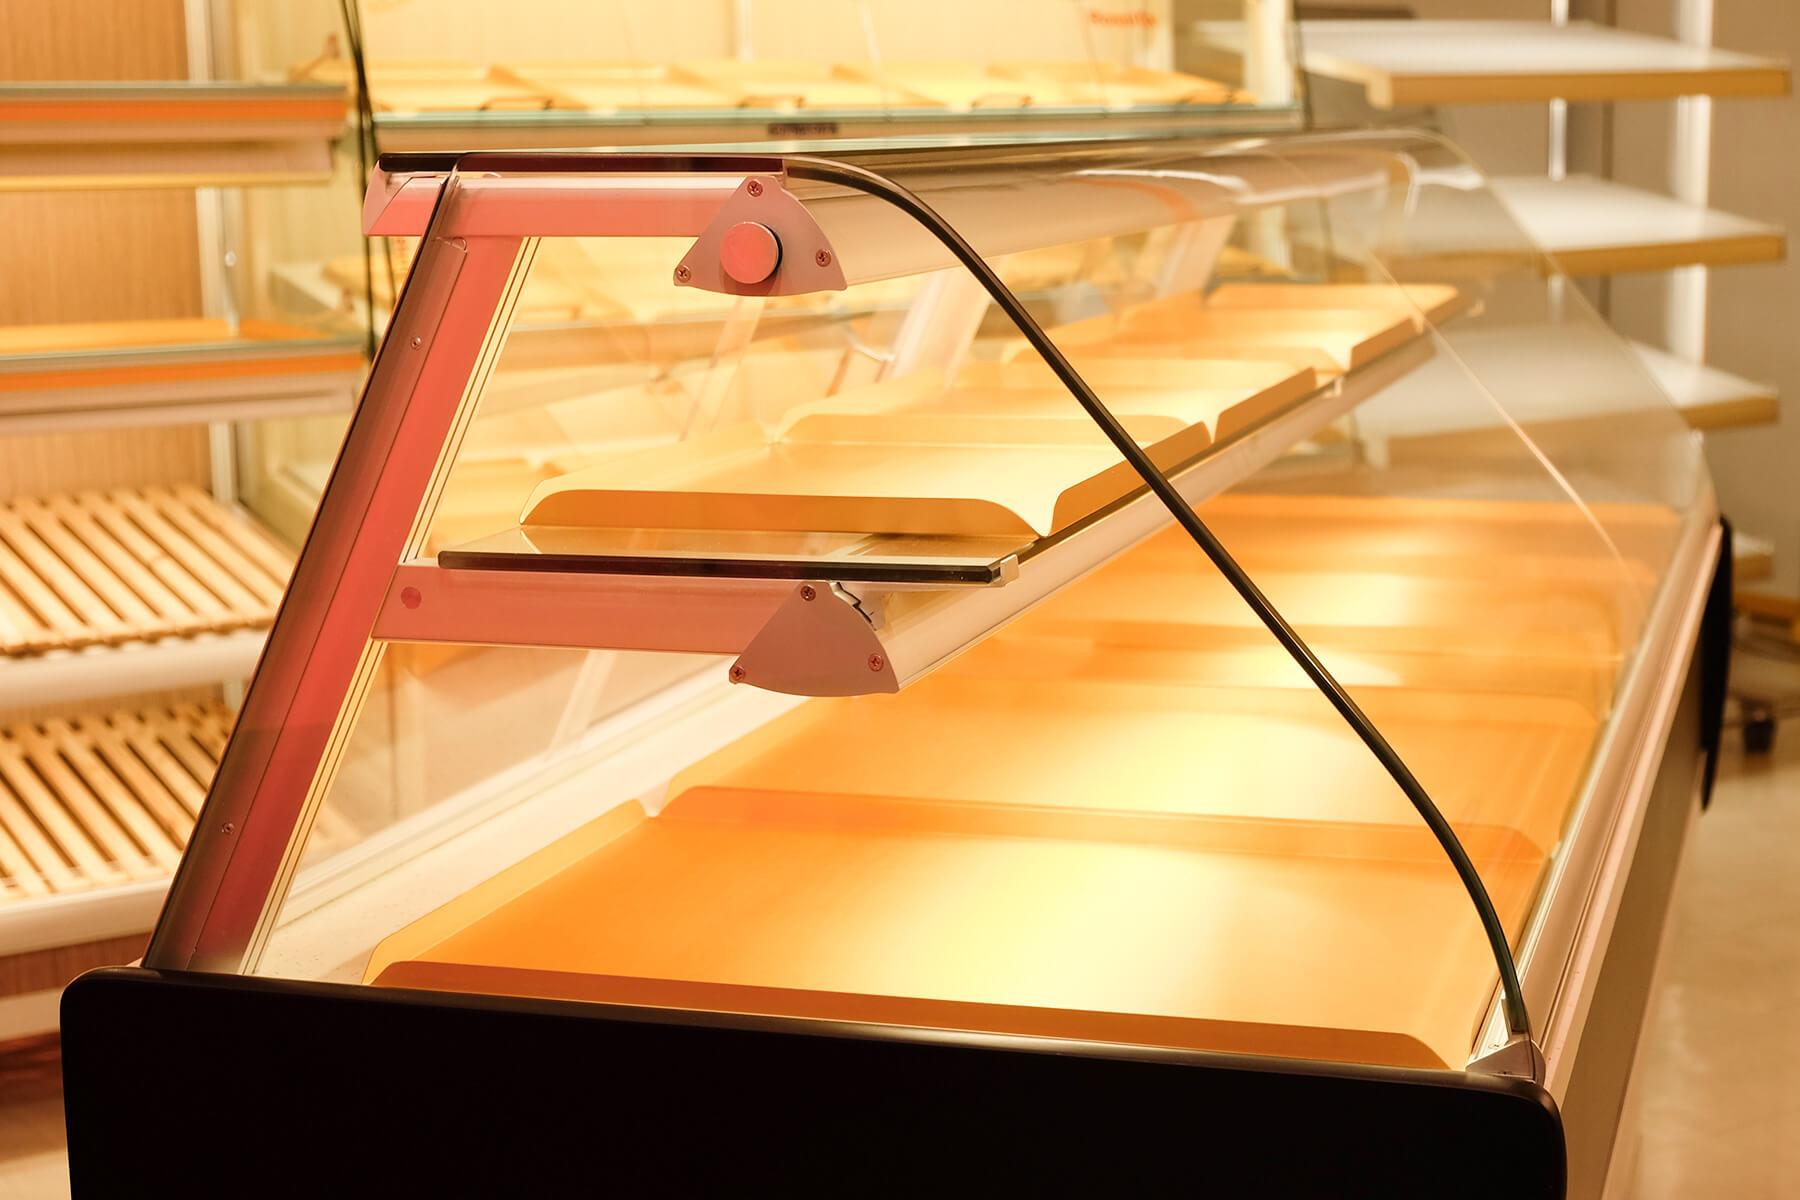 Optima Full-Service Bakery